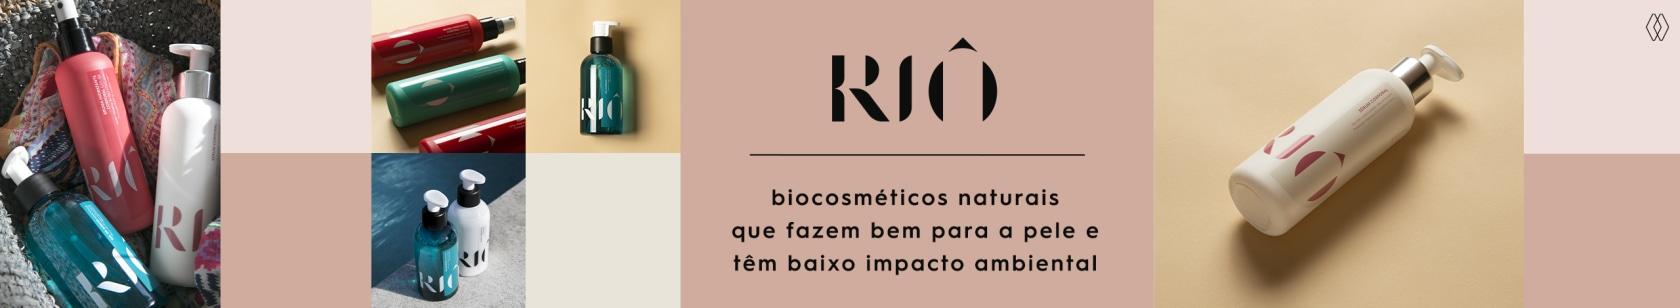 RIÔ BIOCOSMÉTICOS | AMARO